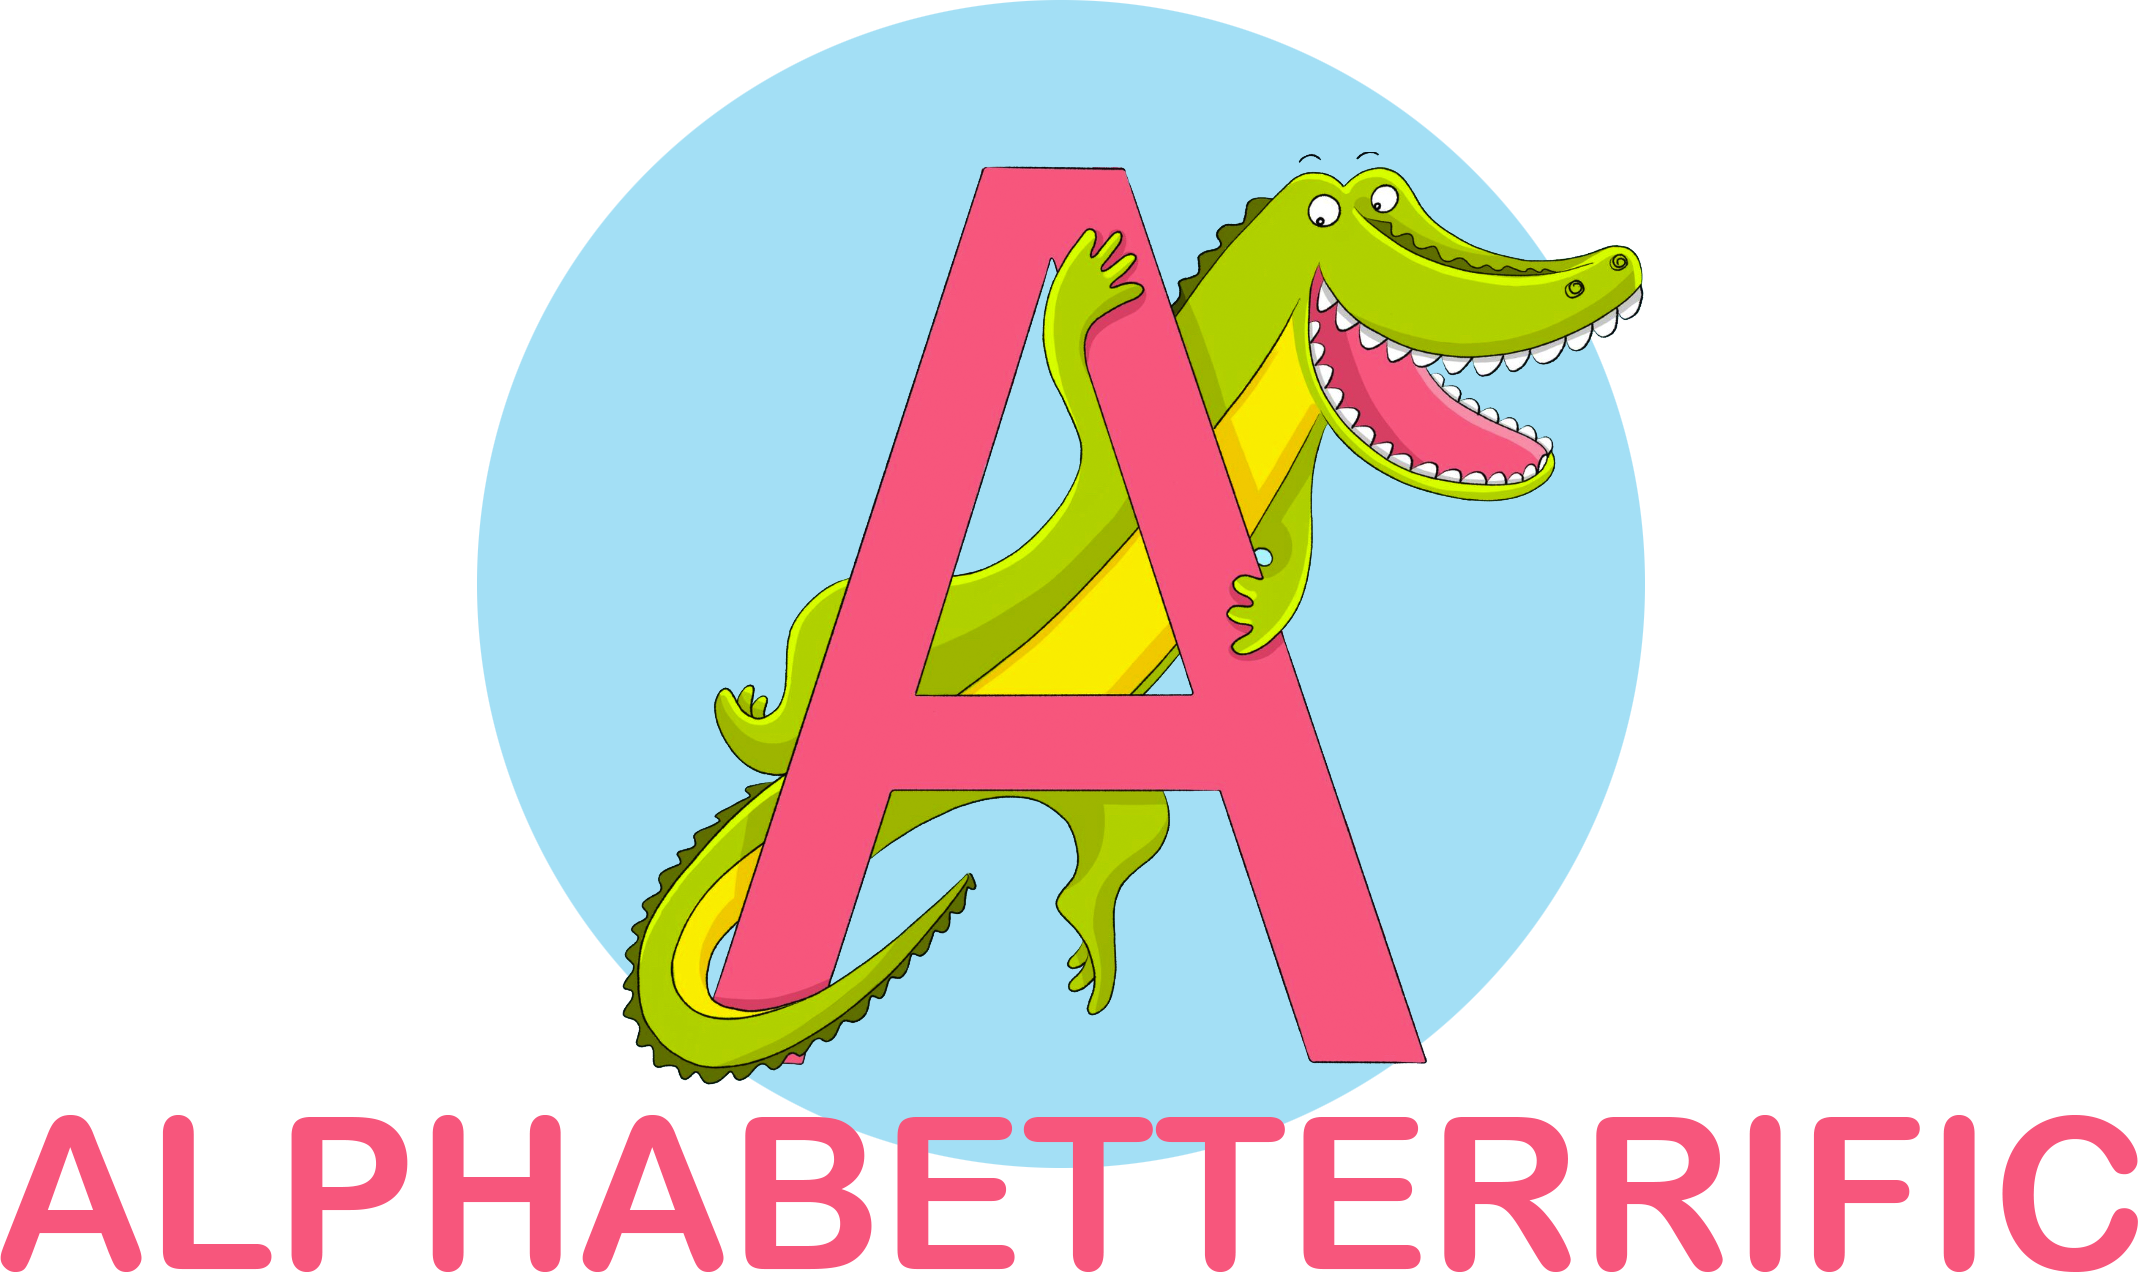 Alphabetterrific